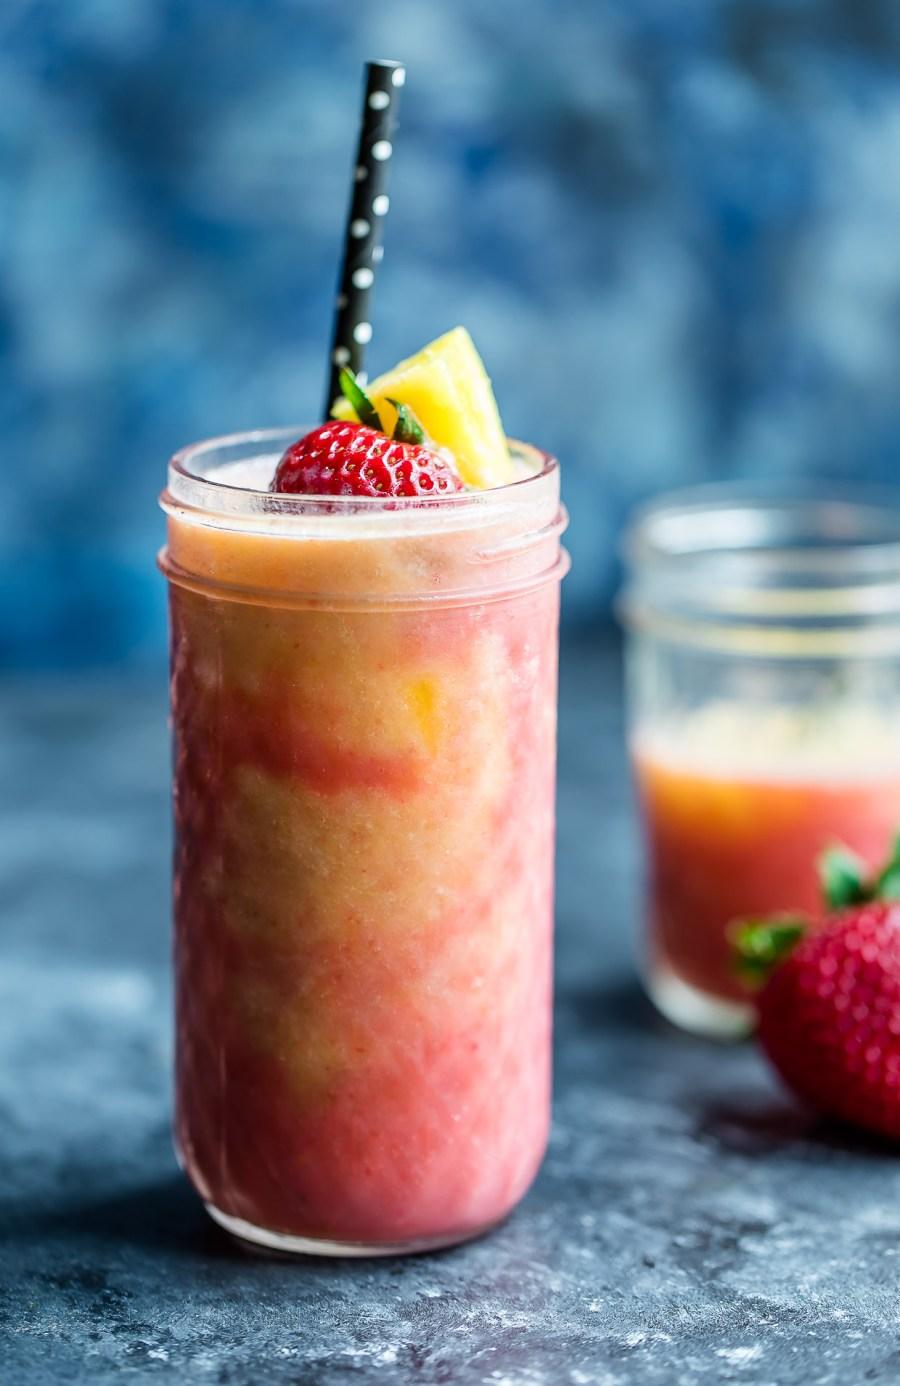 Tropical Pineapple Strawberry Swirl Smoothie with Yogurt and Honey